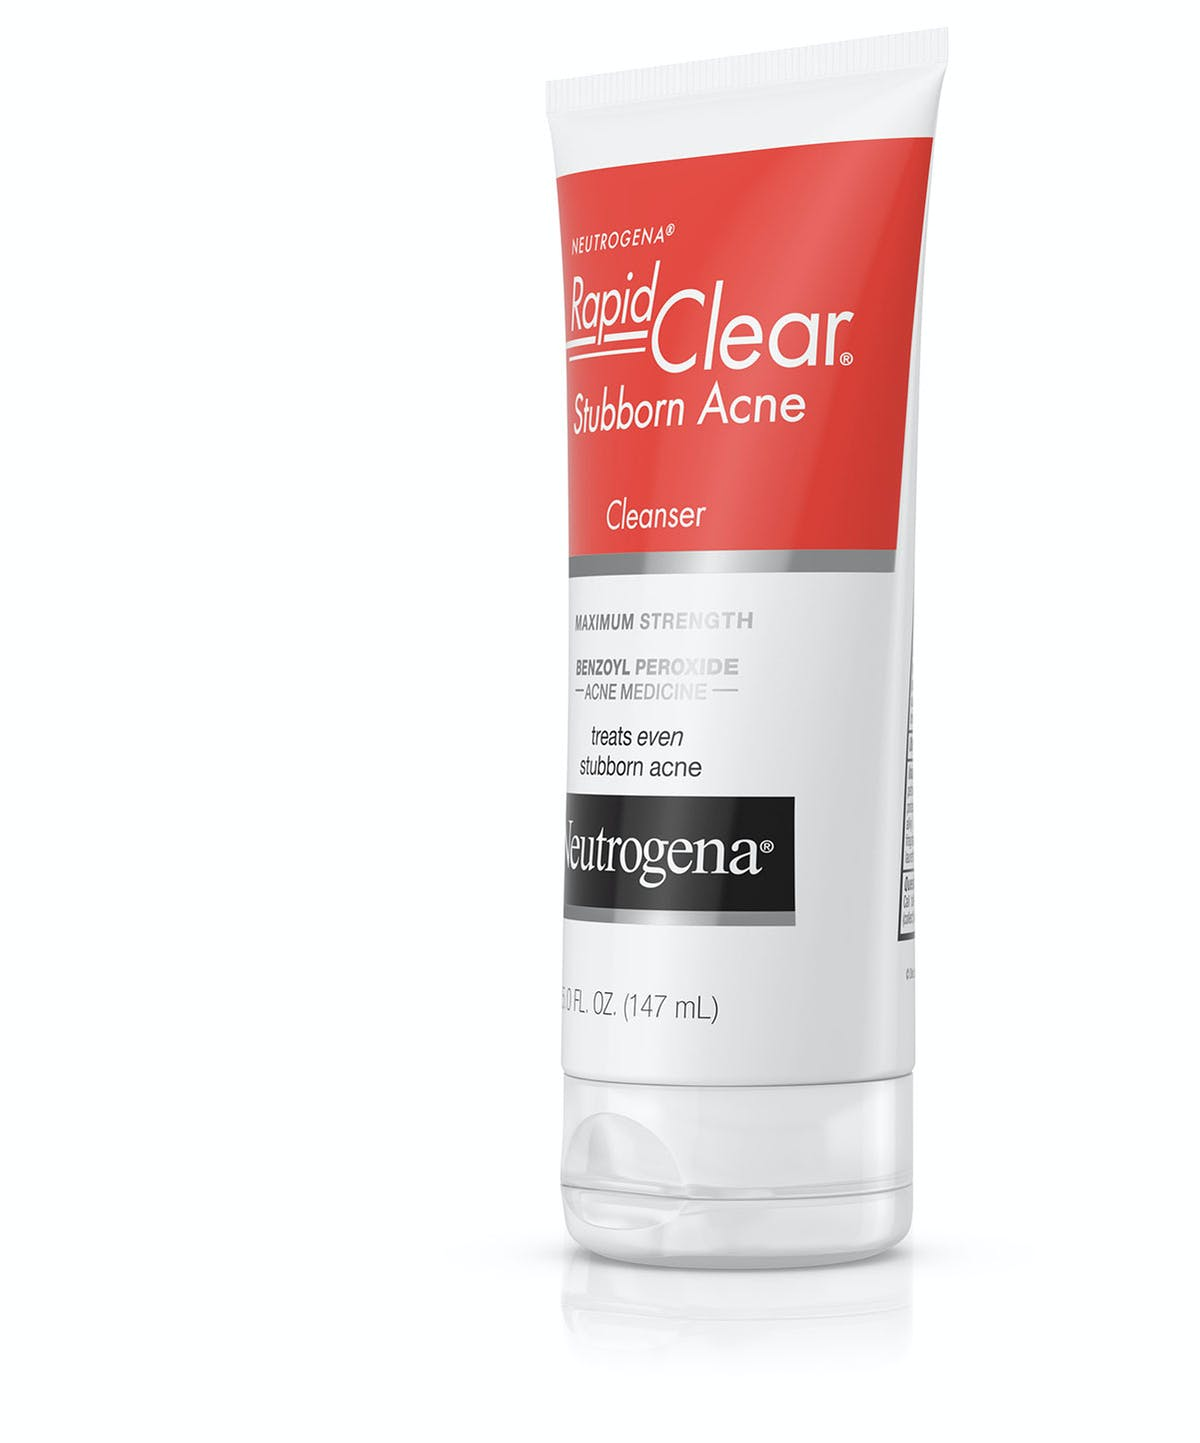 Rapid Clear Stubborn Acne Cleanser